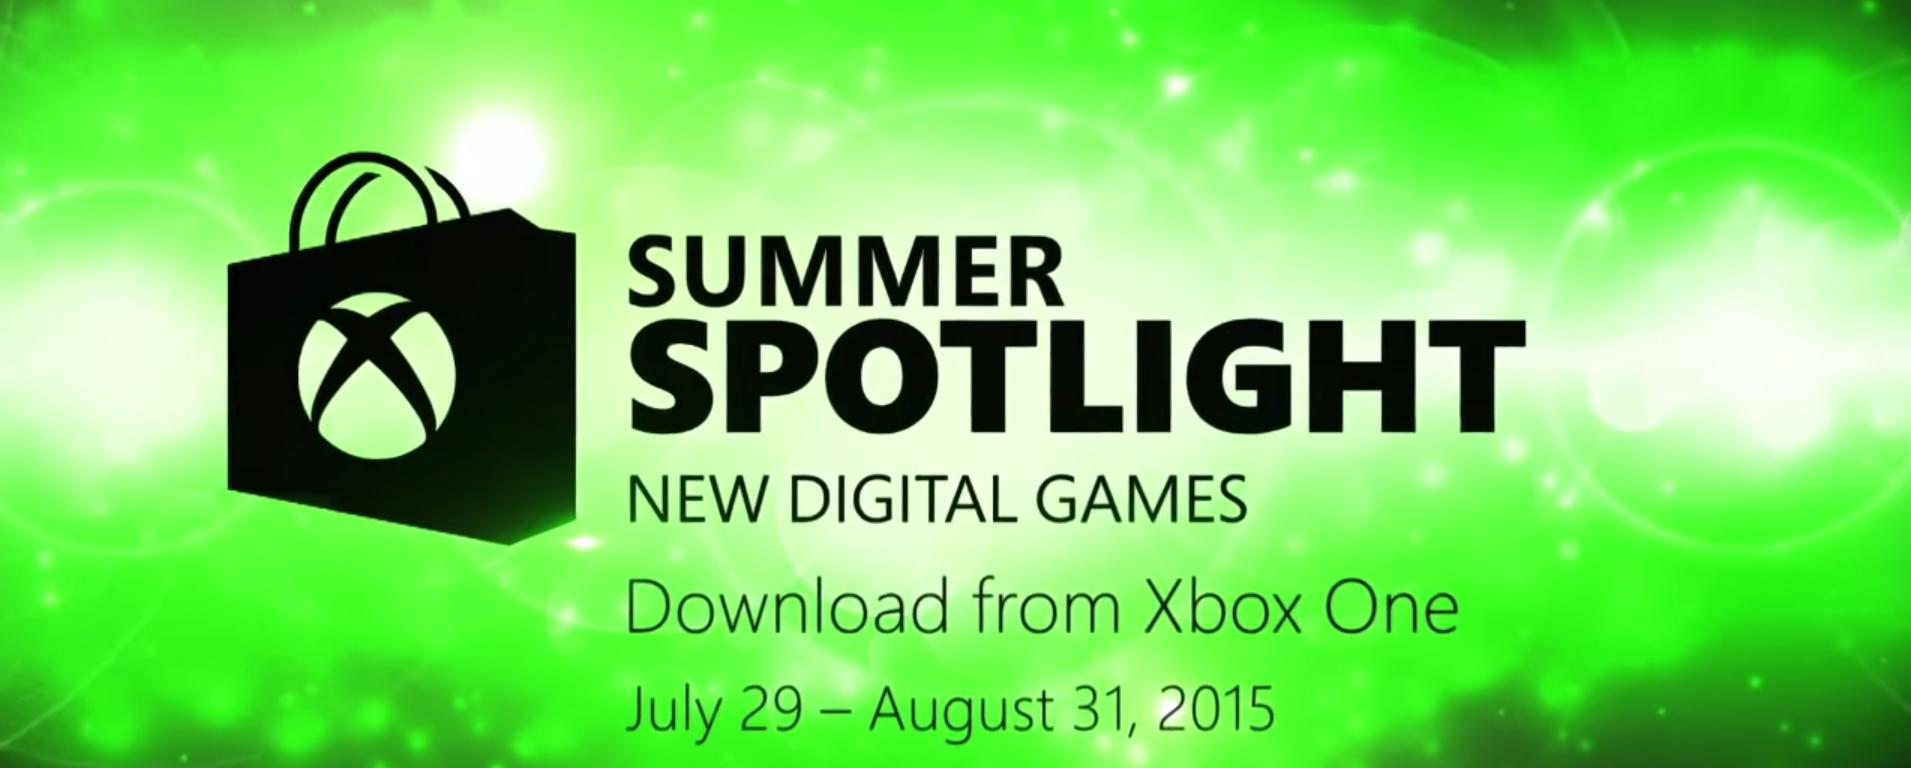 Le Summer Spotlight sur Xbox One